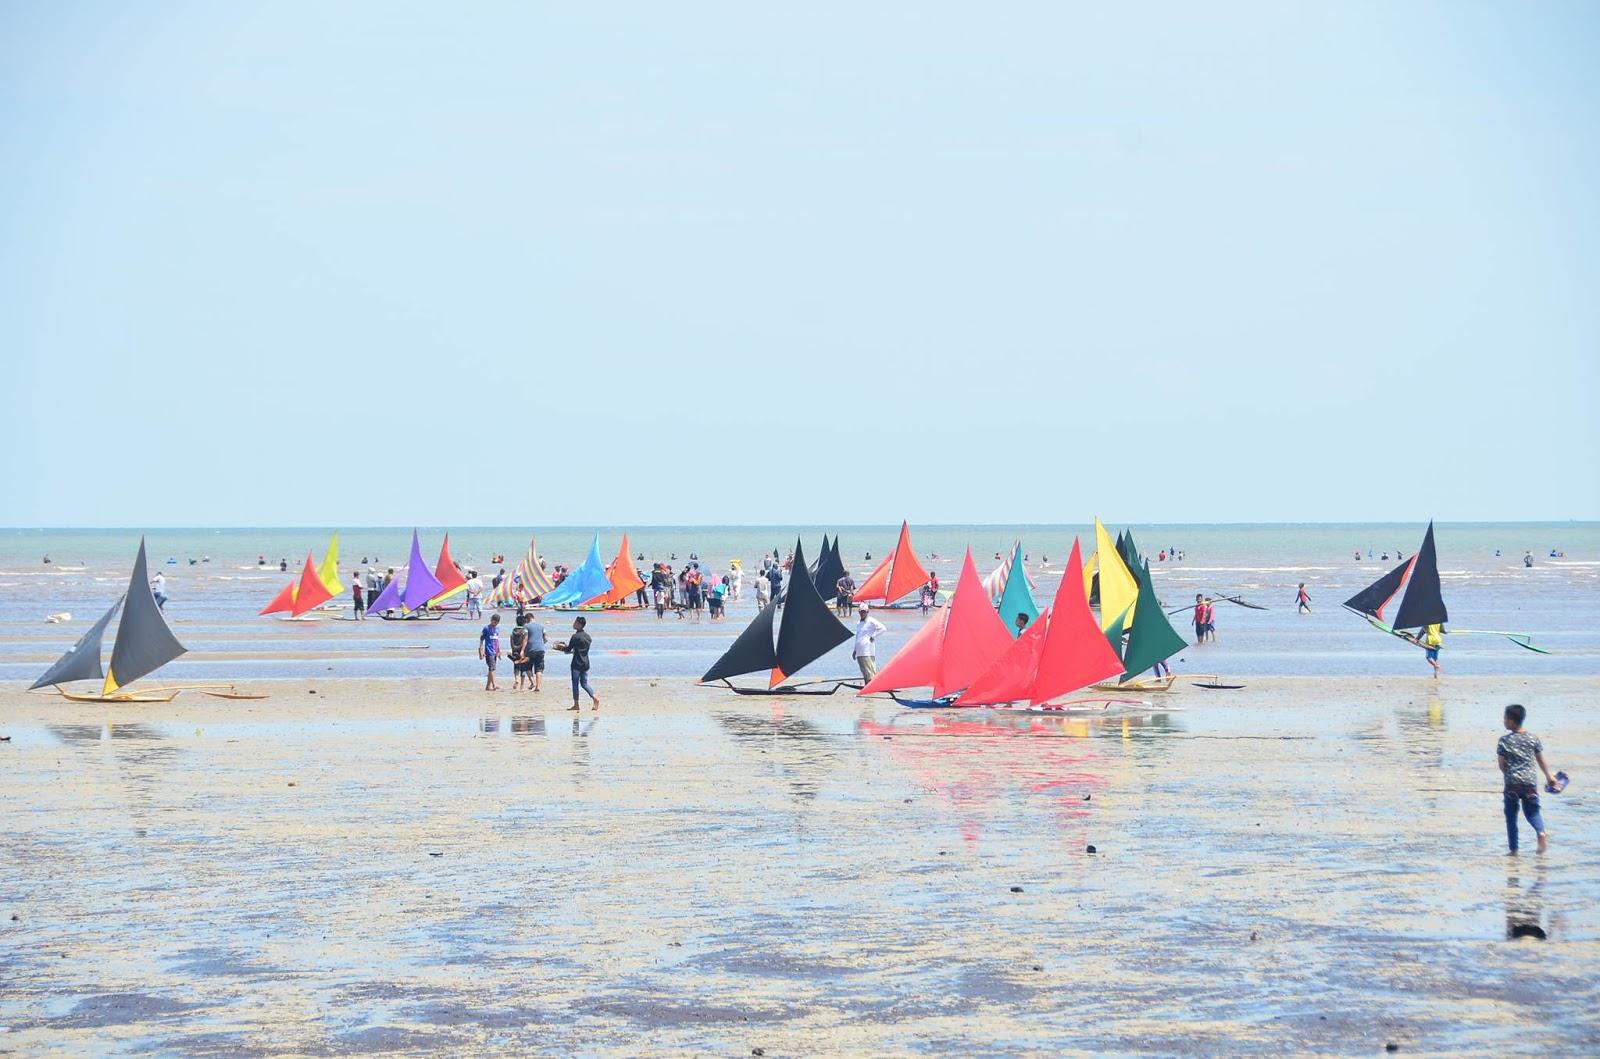 Pantai Tanjung Senekip - Teluk Pambang - Wisata Bengkalis - RiauMagz